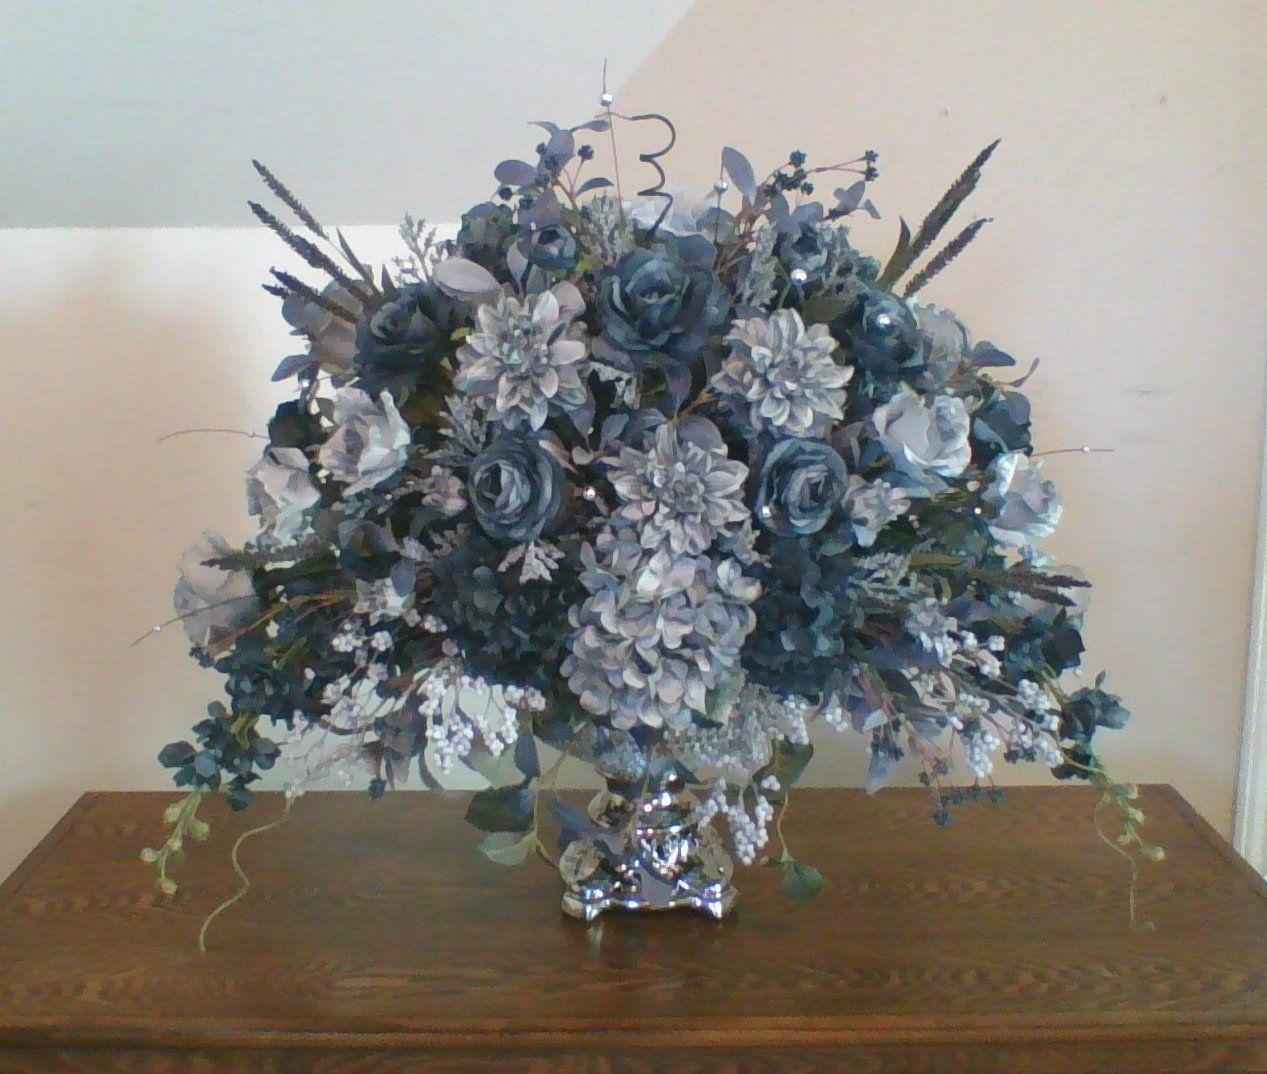 Floral Arragement Midnight Blue Centerpiece Elegant Luxury Etsy Blue Centerpieces Floral Arrangements Floral